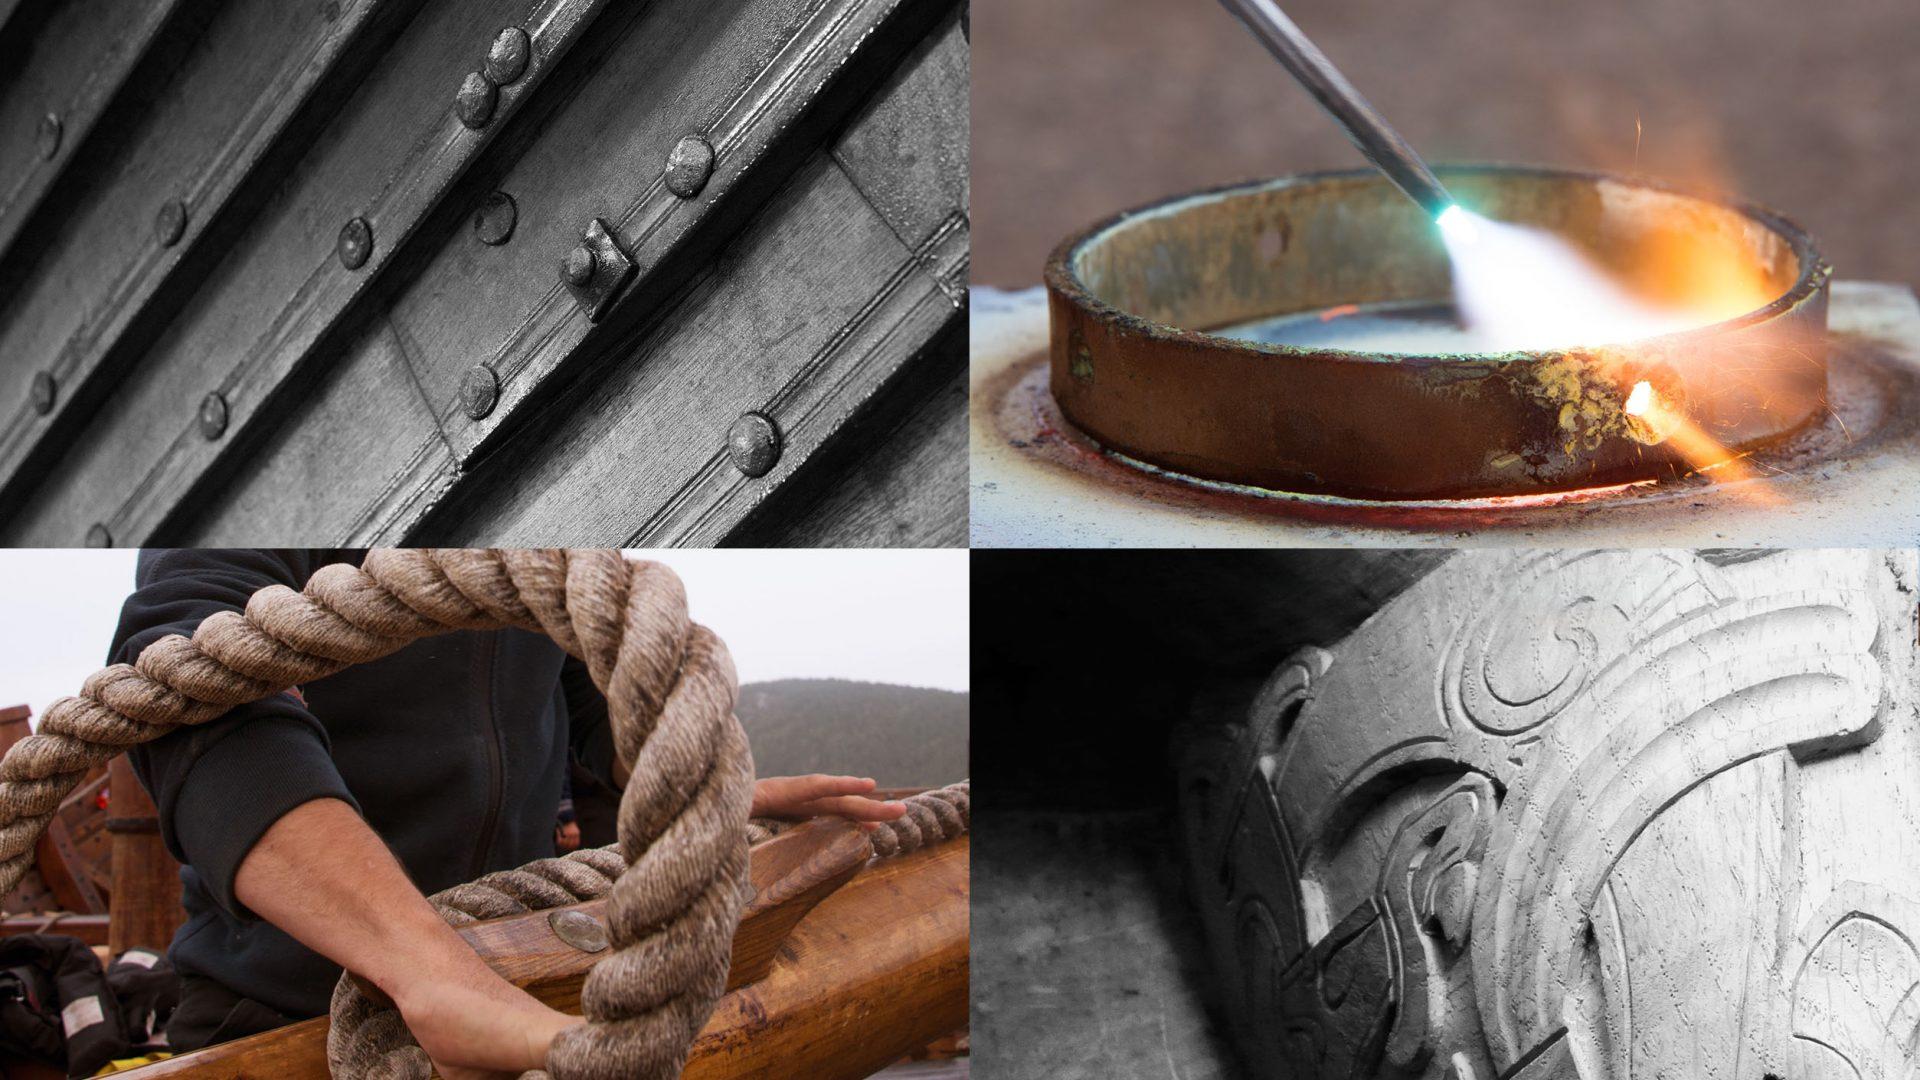 Fine craftsmanship built Draken Harald Hårfagre, with materials used throughout history. Oak, tar, hemp, iron and silk.